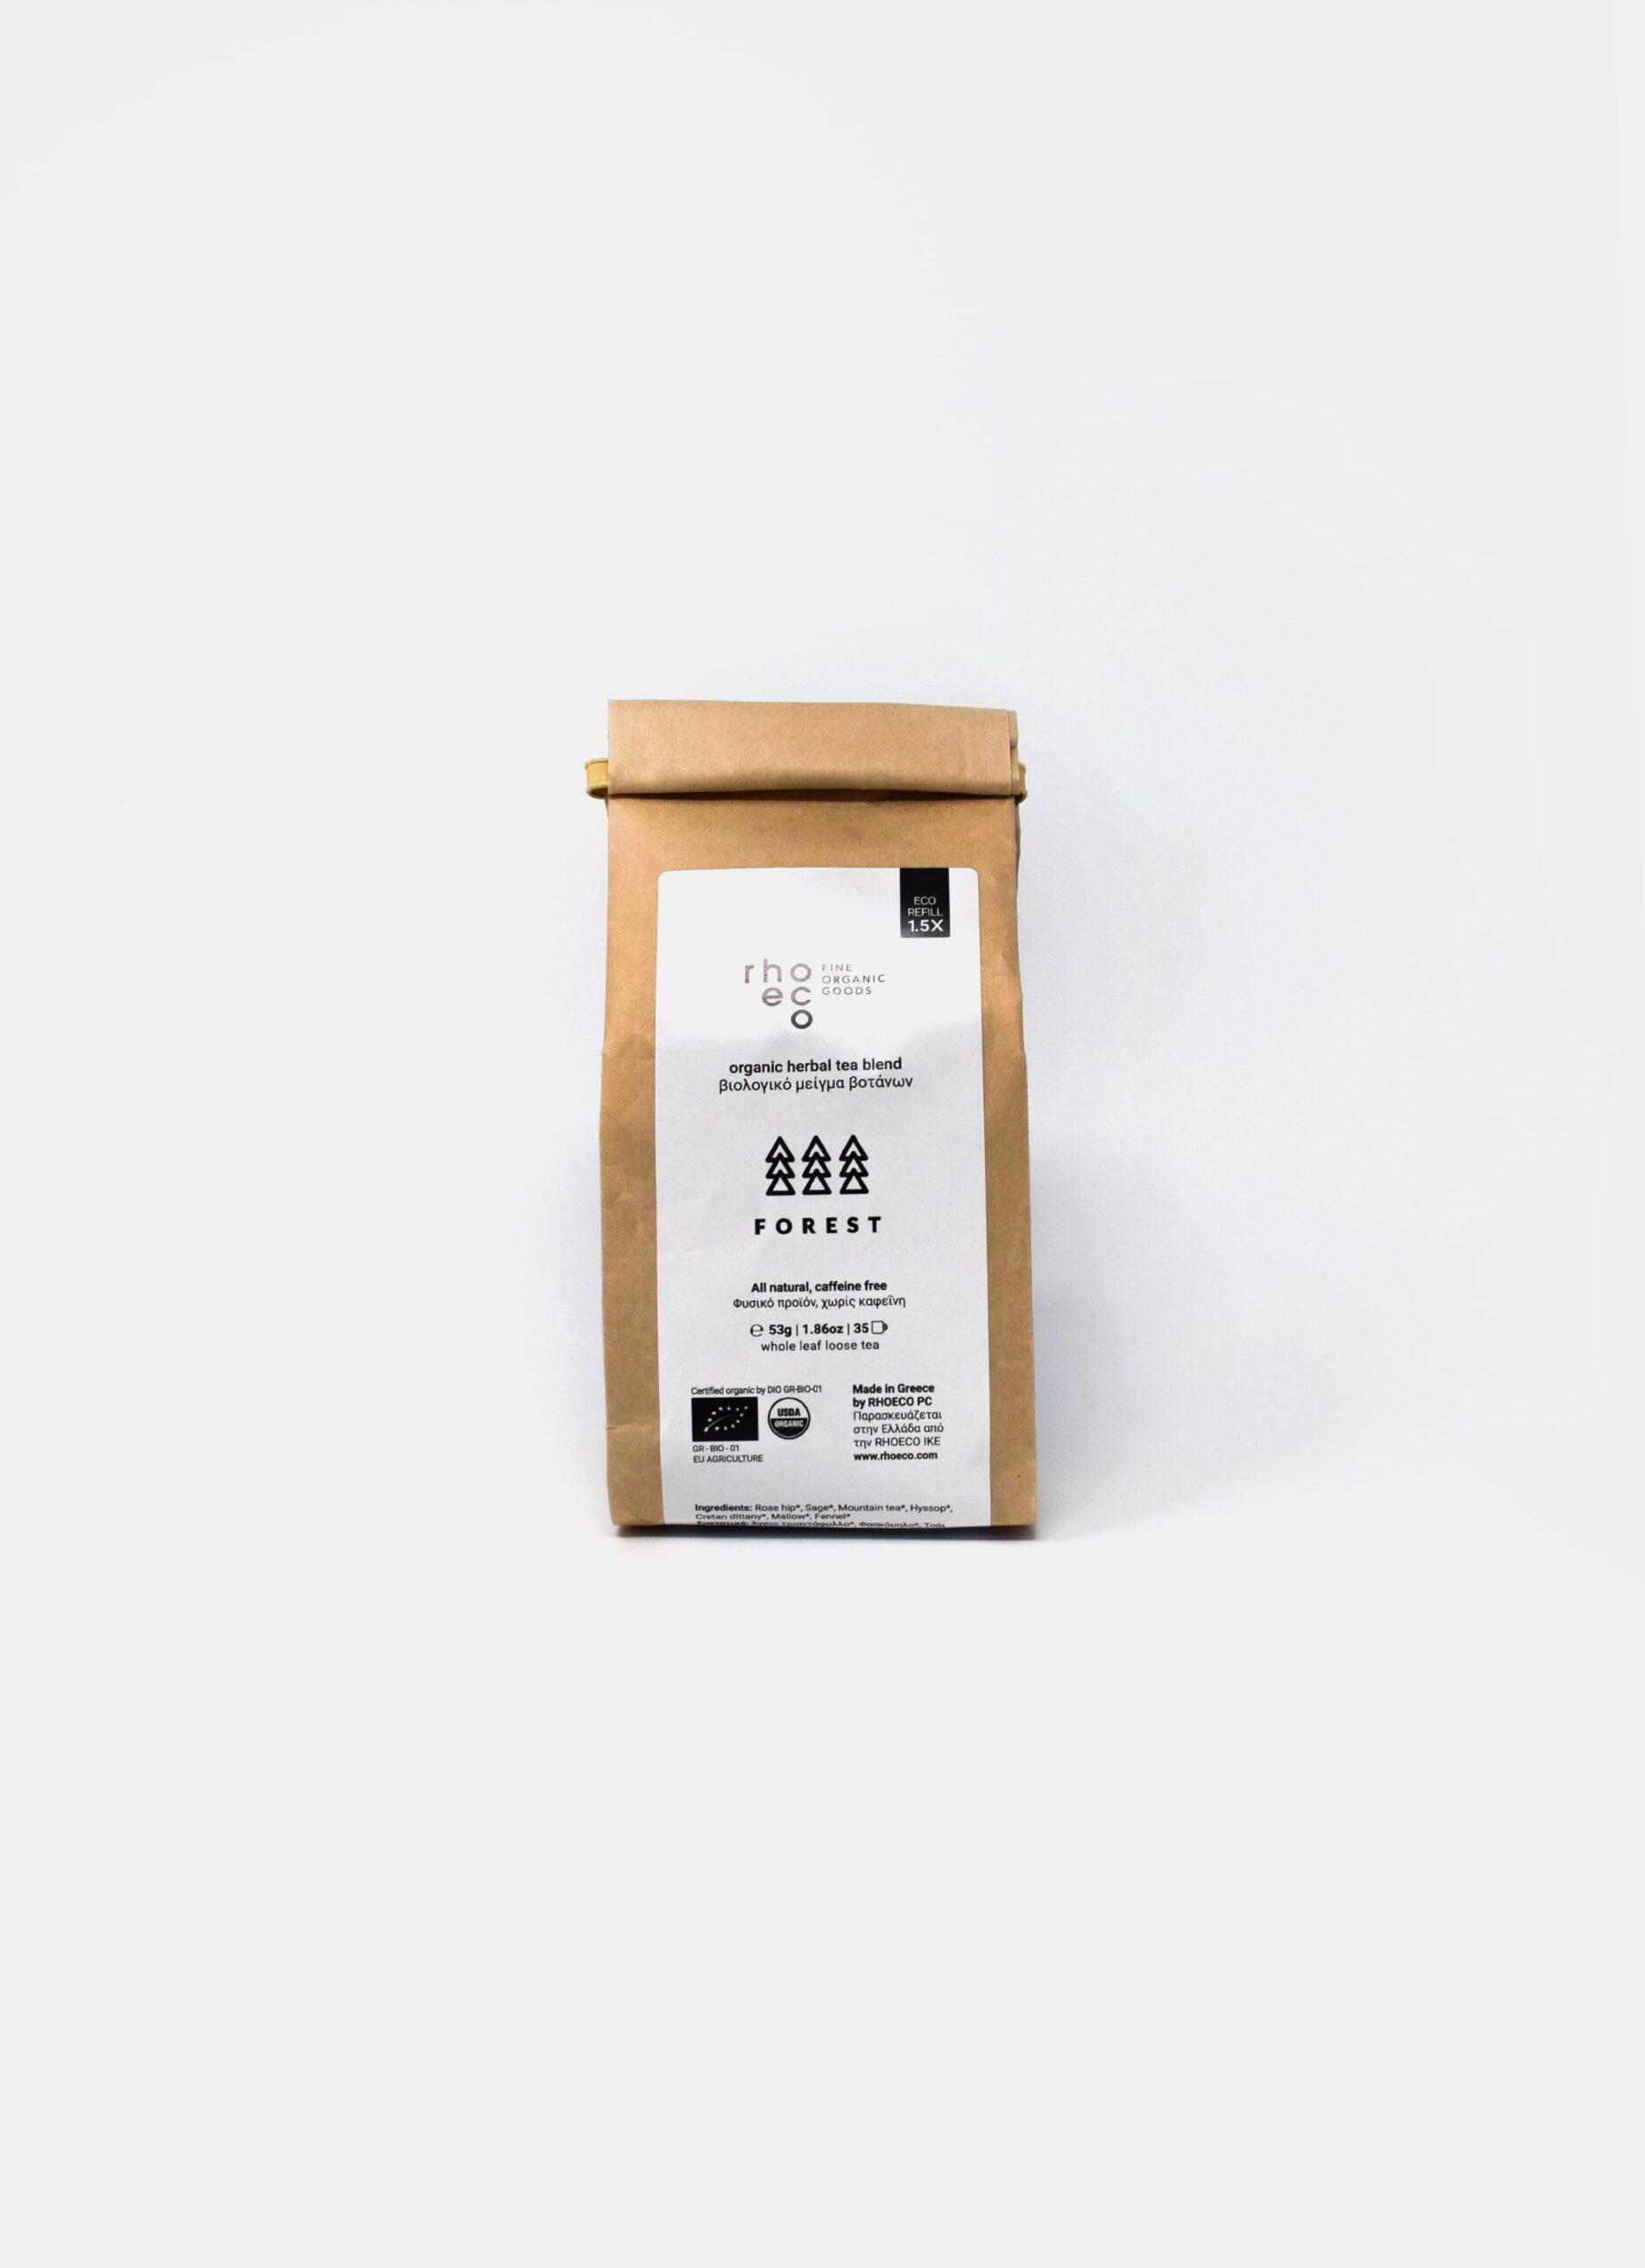 Rhoeco - Organic Tea - Forest - 53g